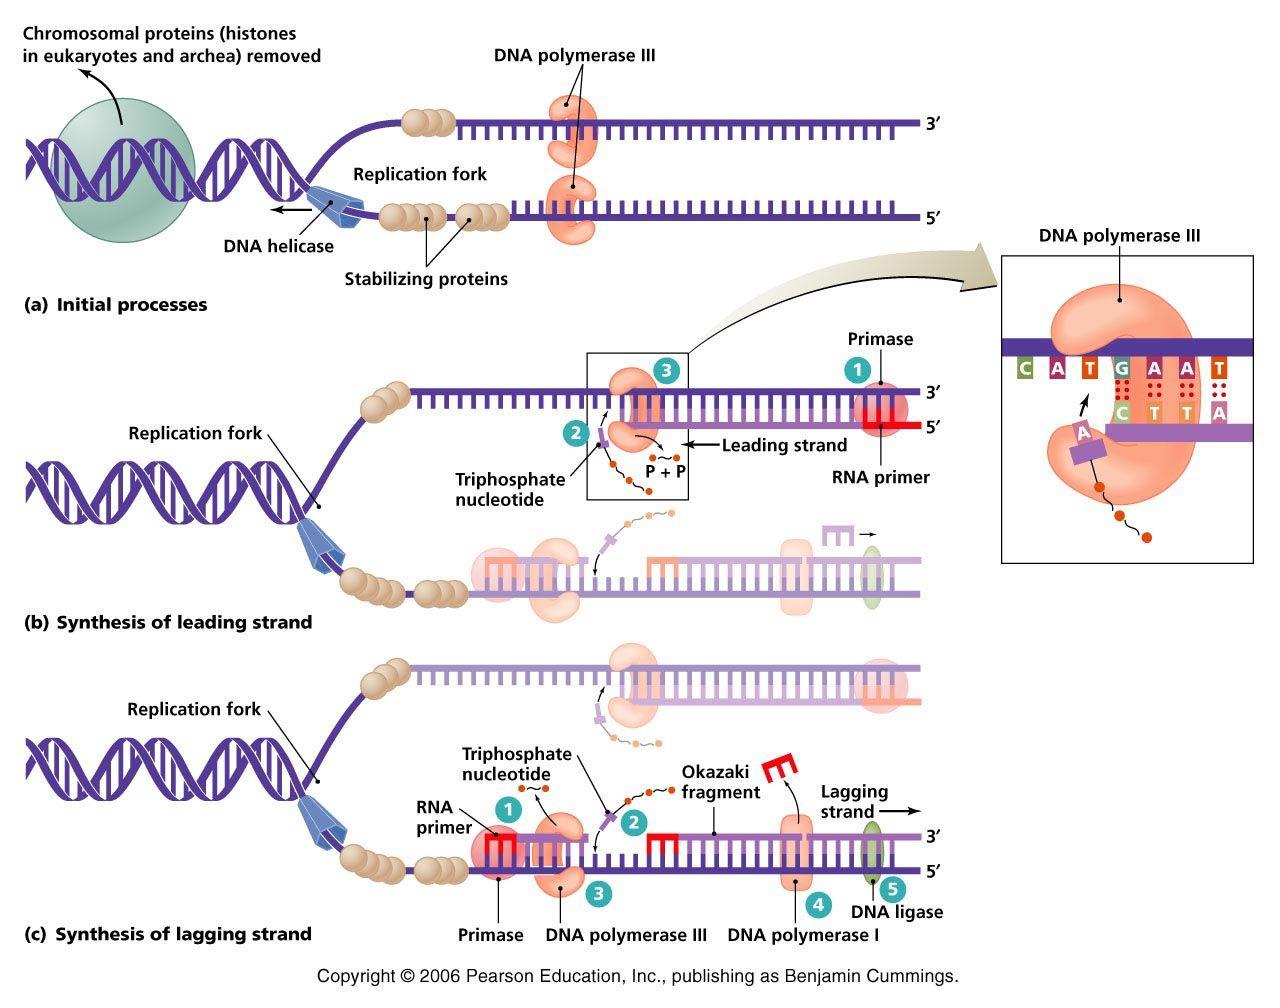 dna replication bchm 2024 concepts of biochemistry pinterest dna replication genetics. Black Bedroom Furniture Sets. Home Design Ideas